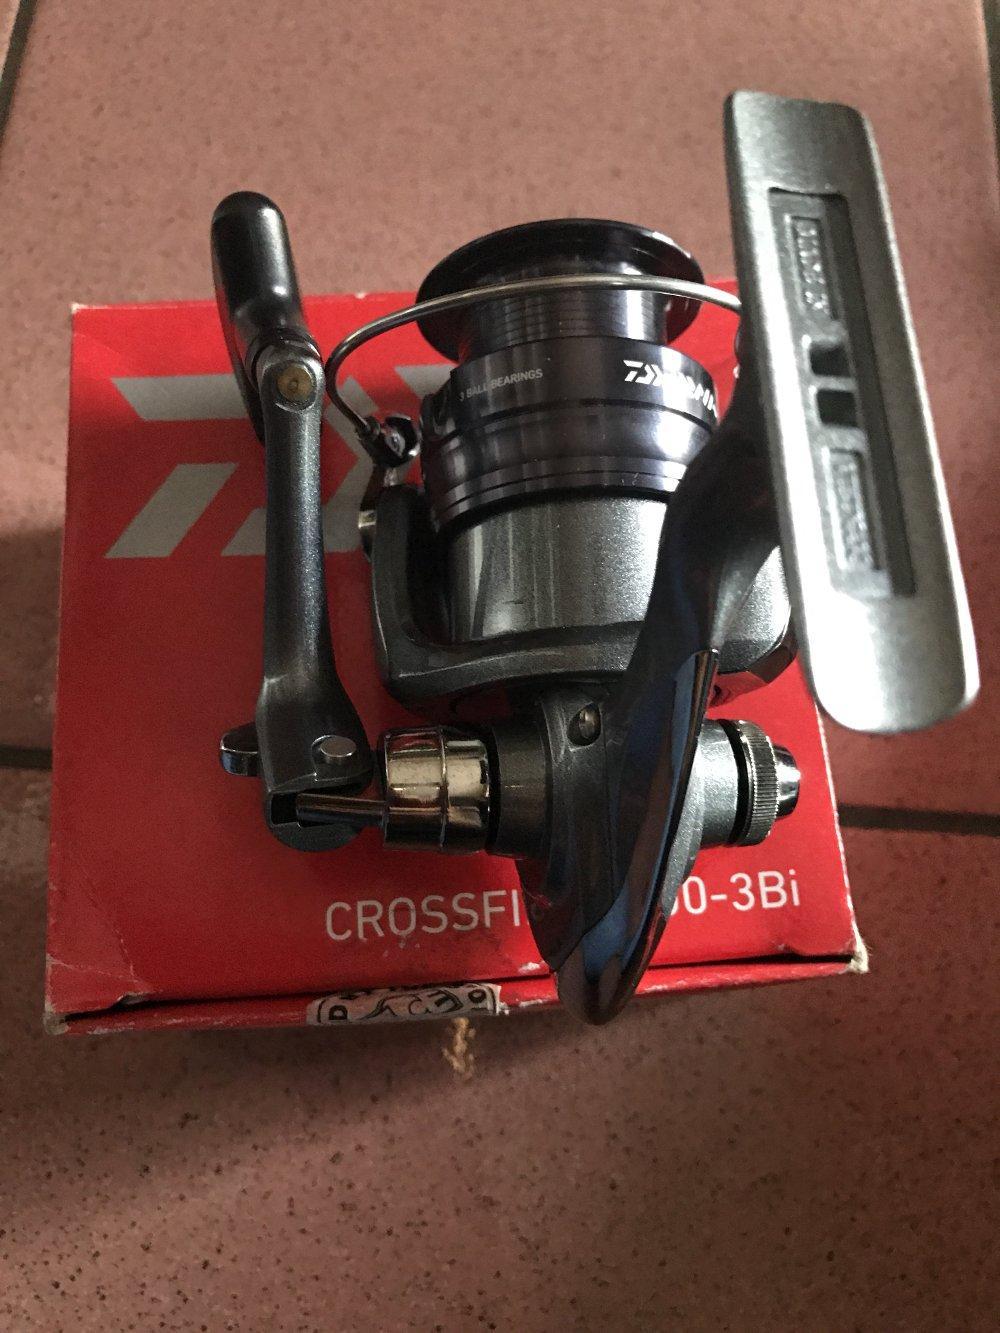 Reel Daiwa Crossfire 25003Bi Terlariss